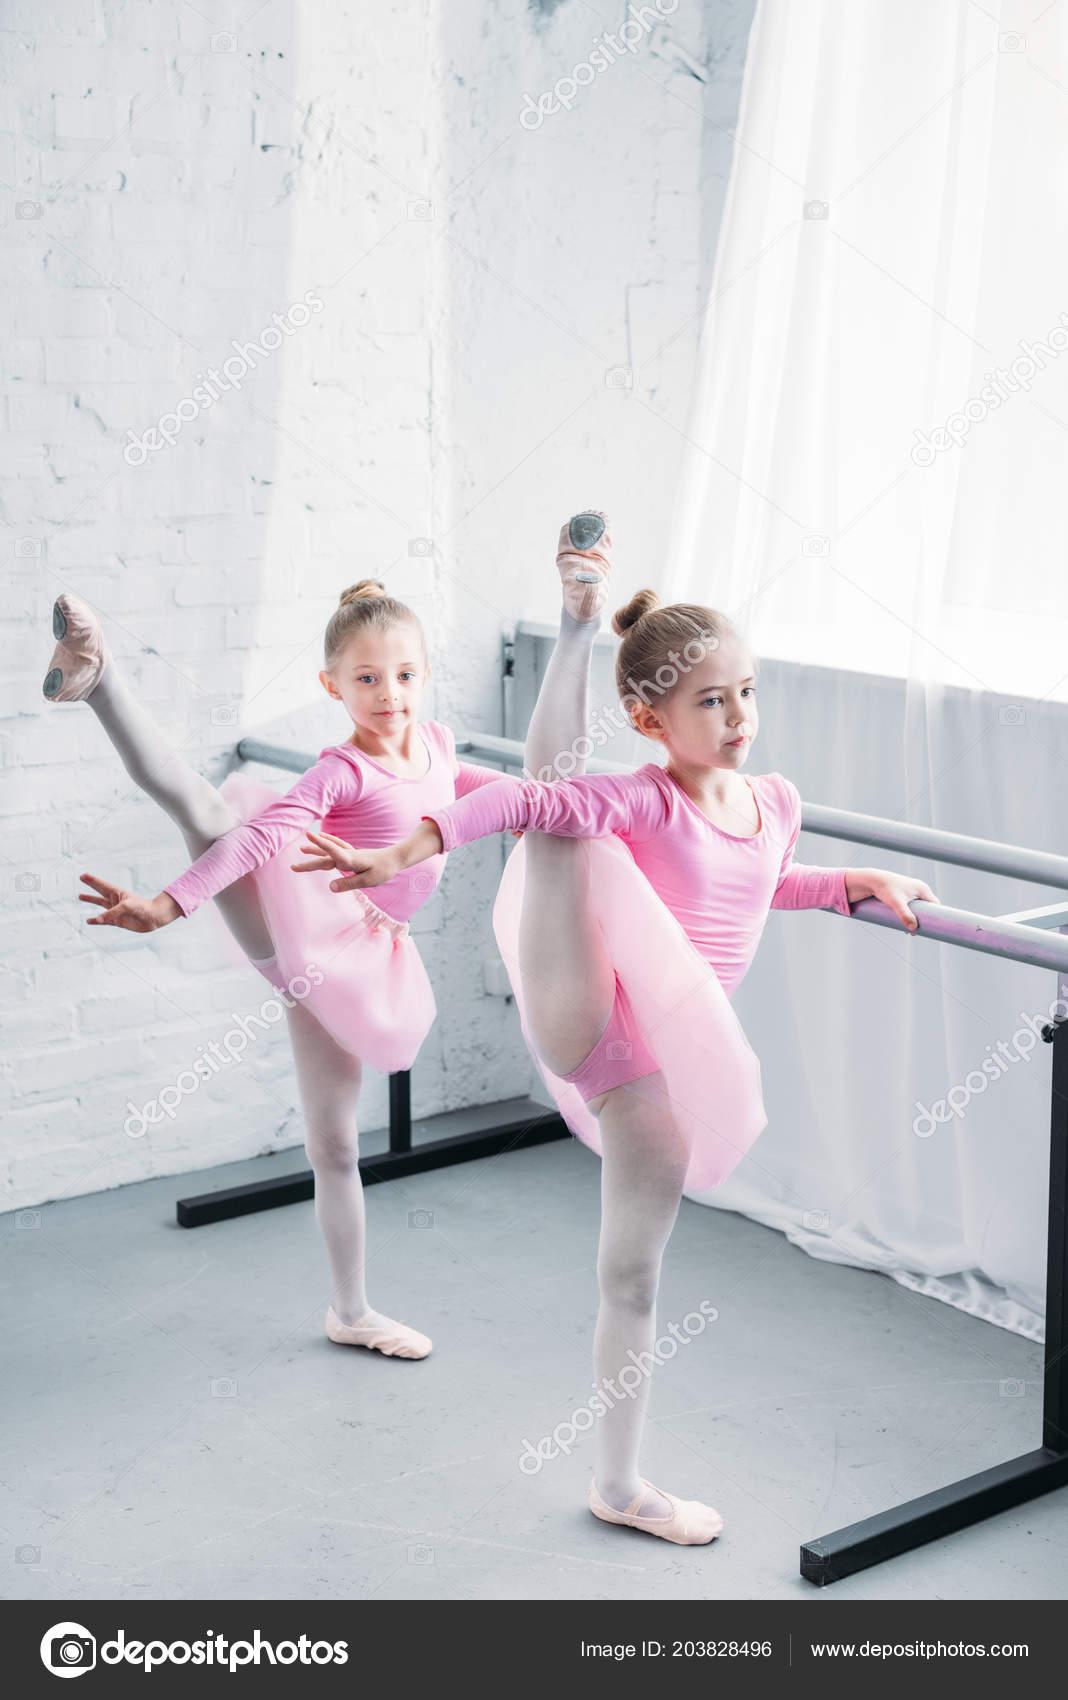 bb91a6e58e1 Χαριτωμένα παιδάκια στα ροζ Τουτού φούστες τέντωμα και χορού στη Σχολή  Μπαλέτου — Εικόνα από ...